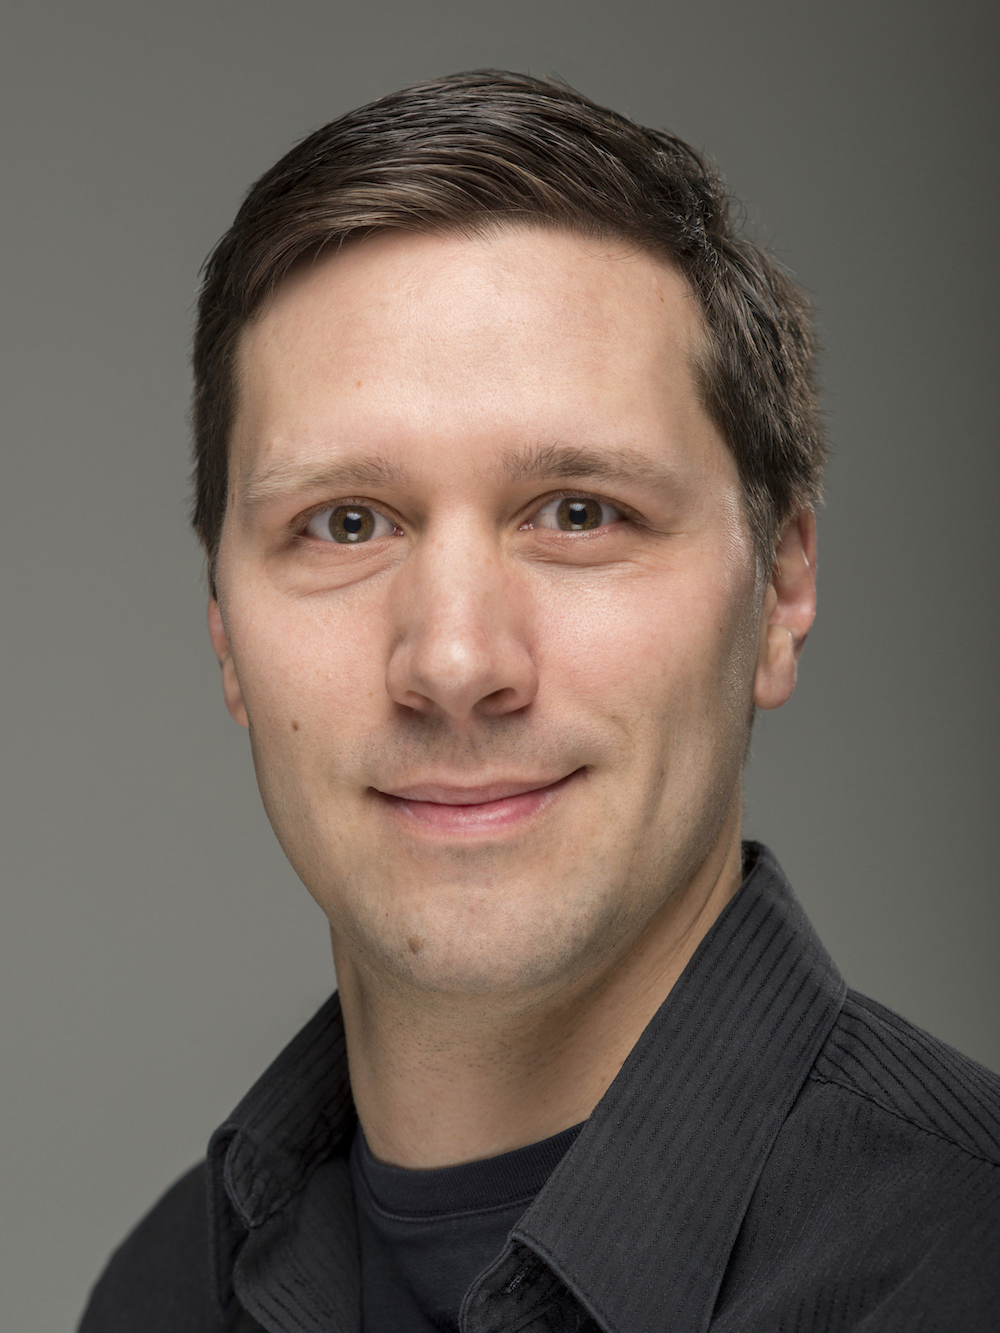 Dr. Justin Lapp